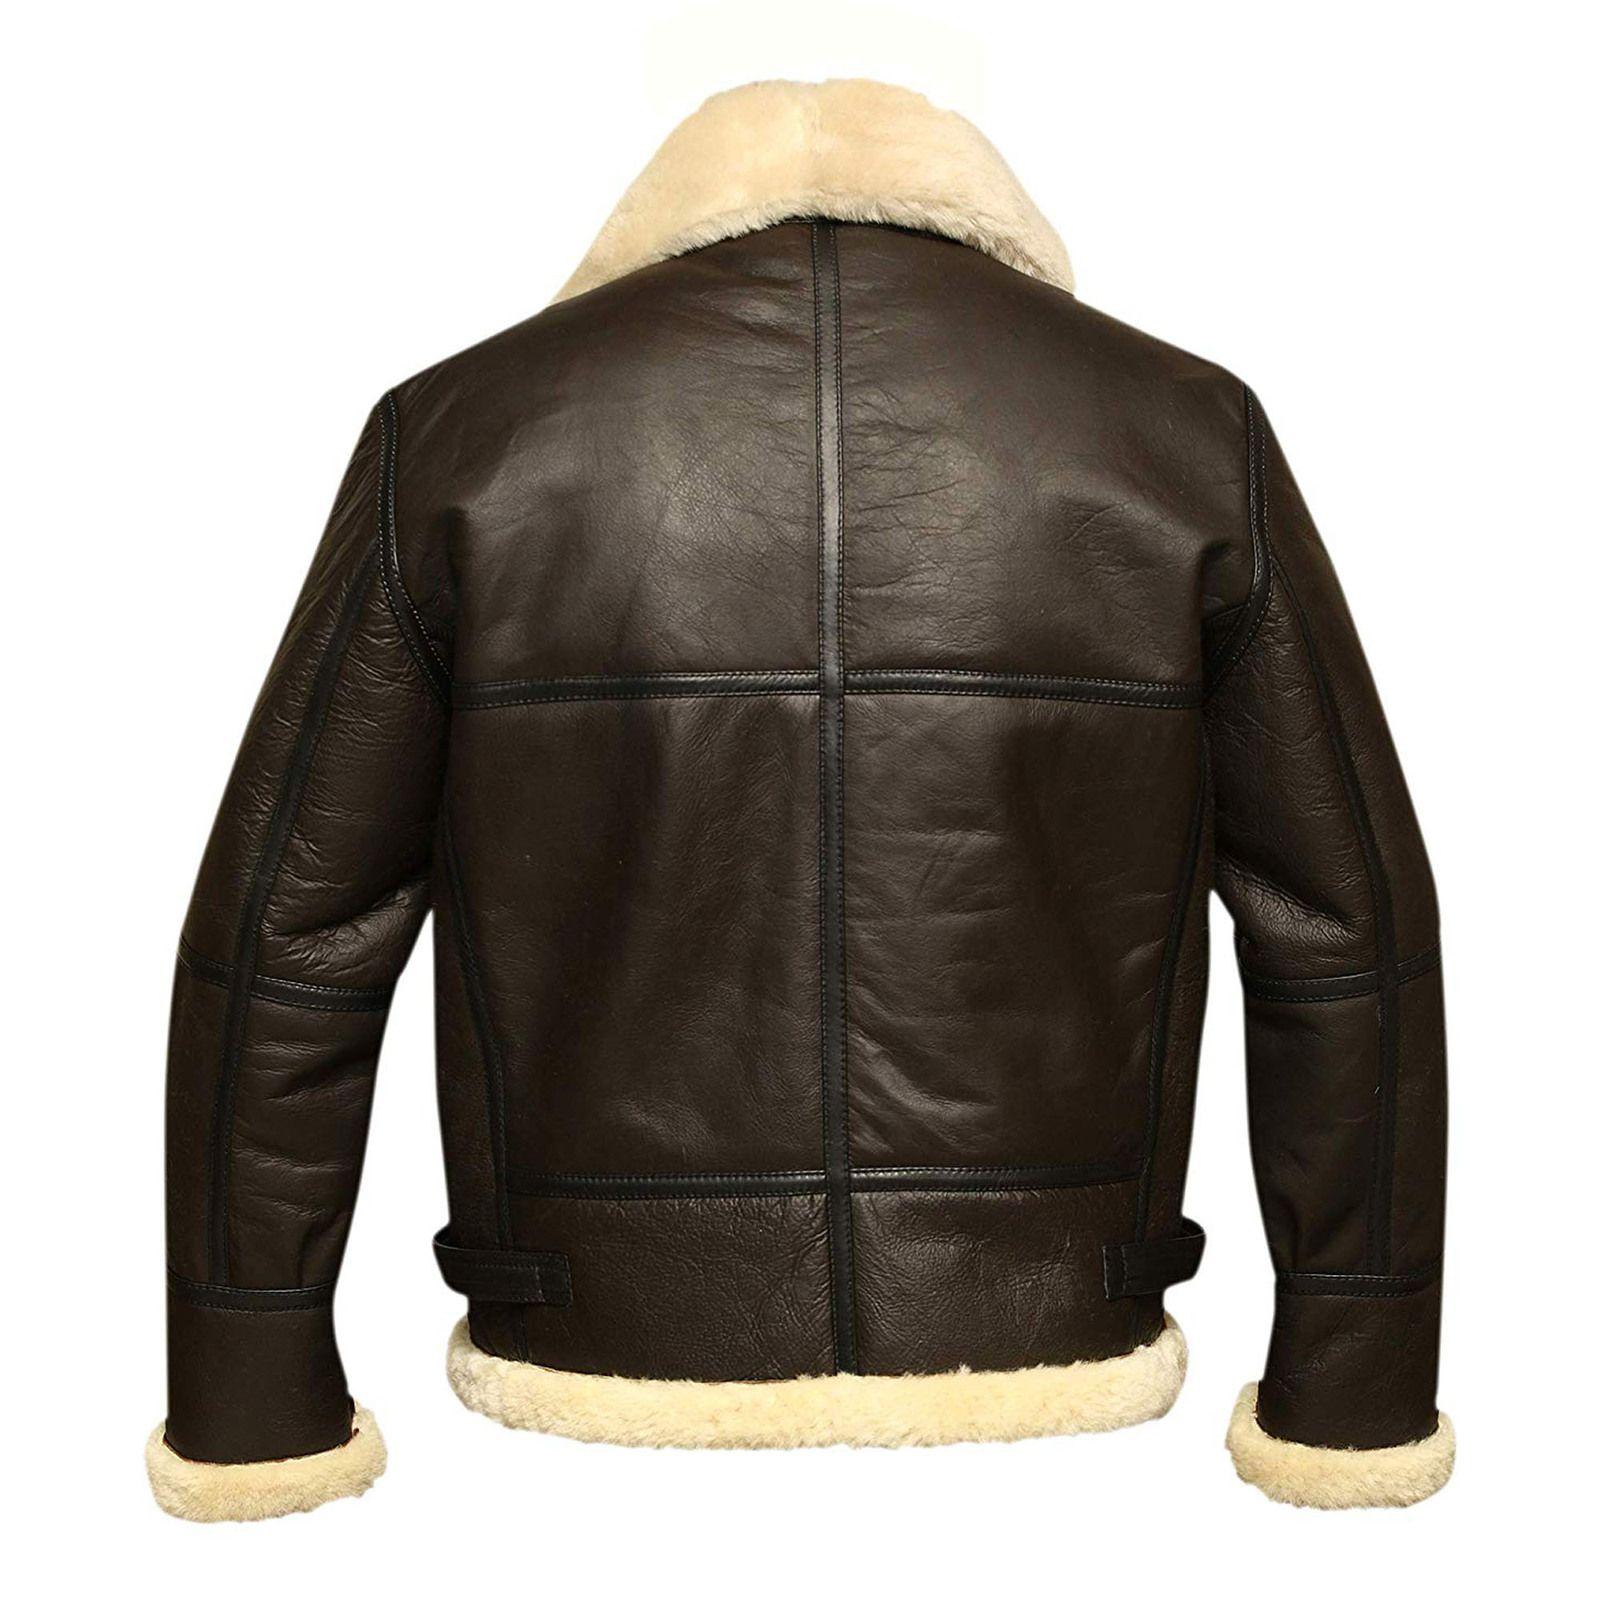 Men B3 Bomber Aviator Shearling Sheepskin Leather Winter Jacket In 2021 Leather Bomber Jacket Sheepskin Jacket Mens Sheepskin Jacket [ 1600 x 1600 Pixel ]